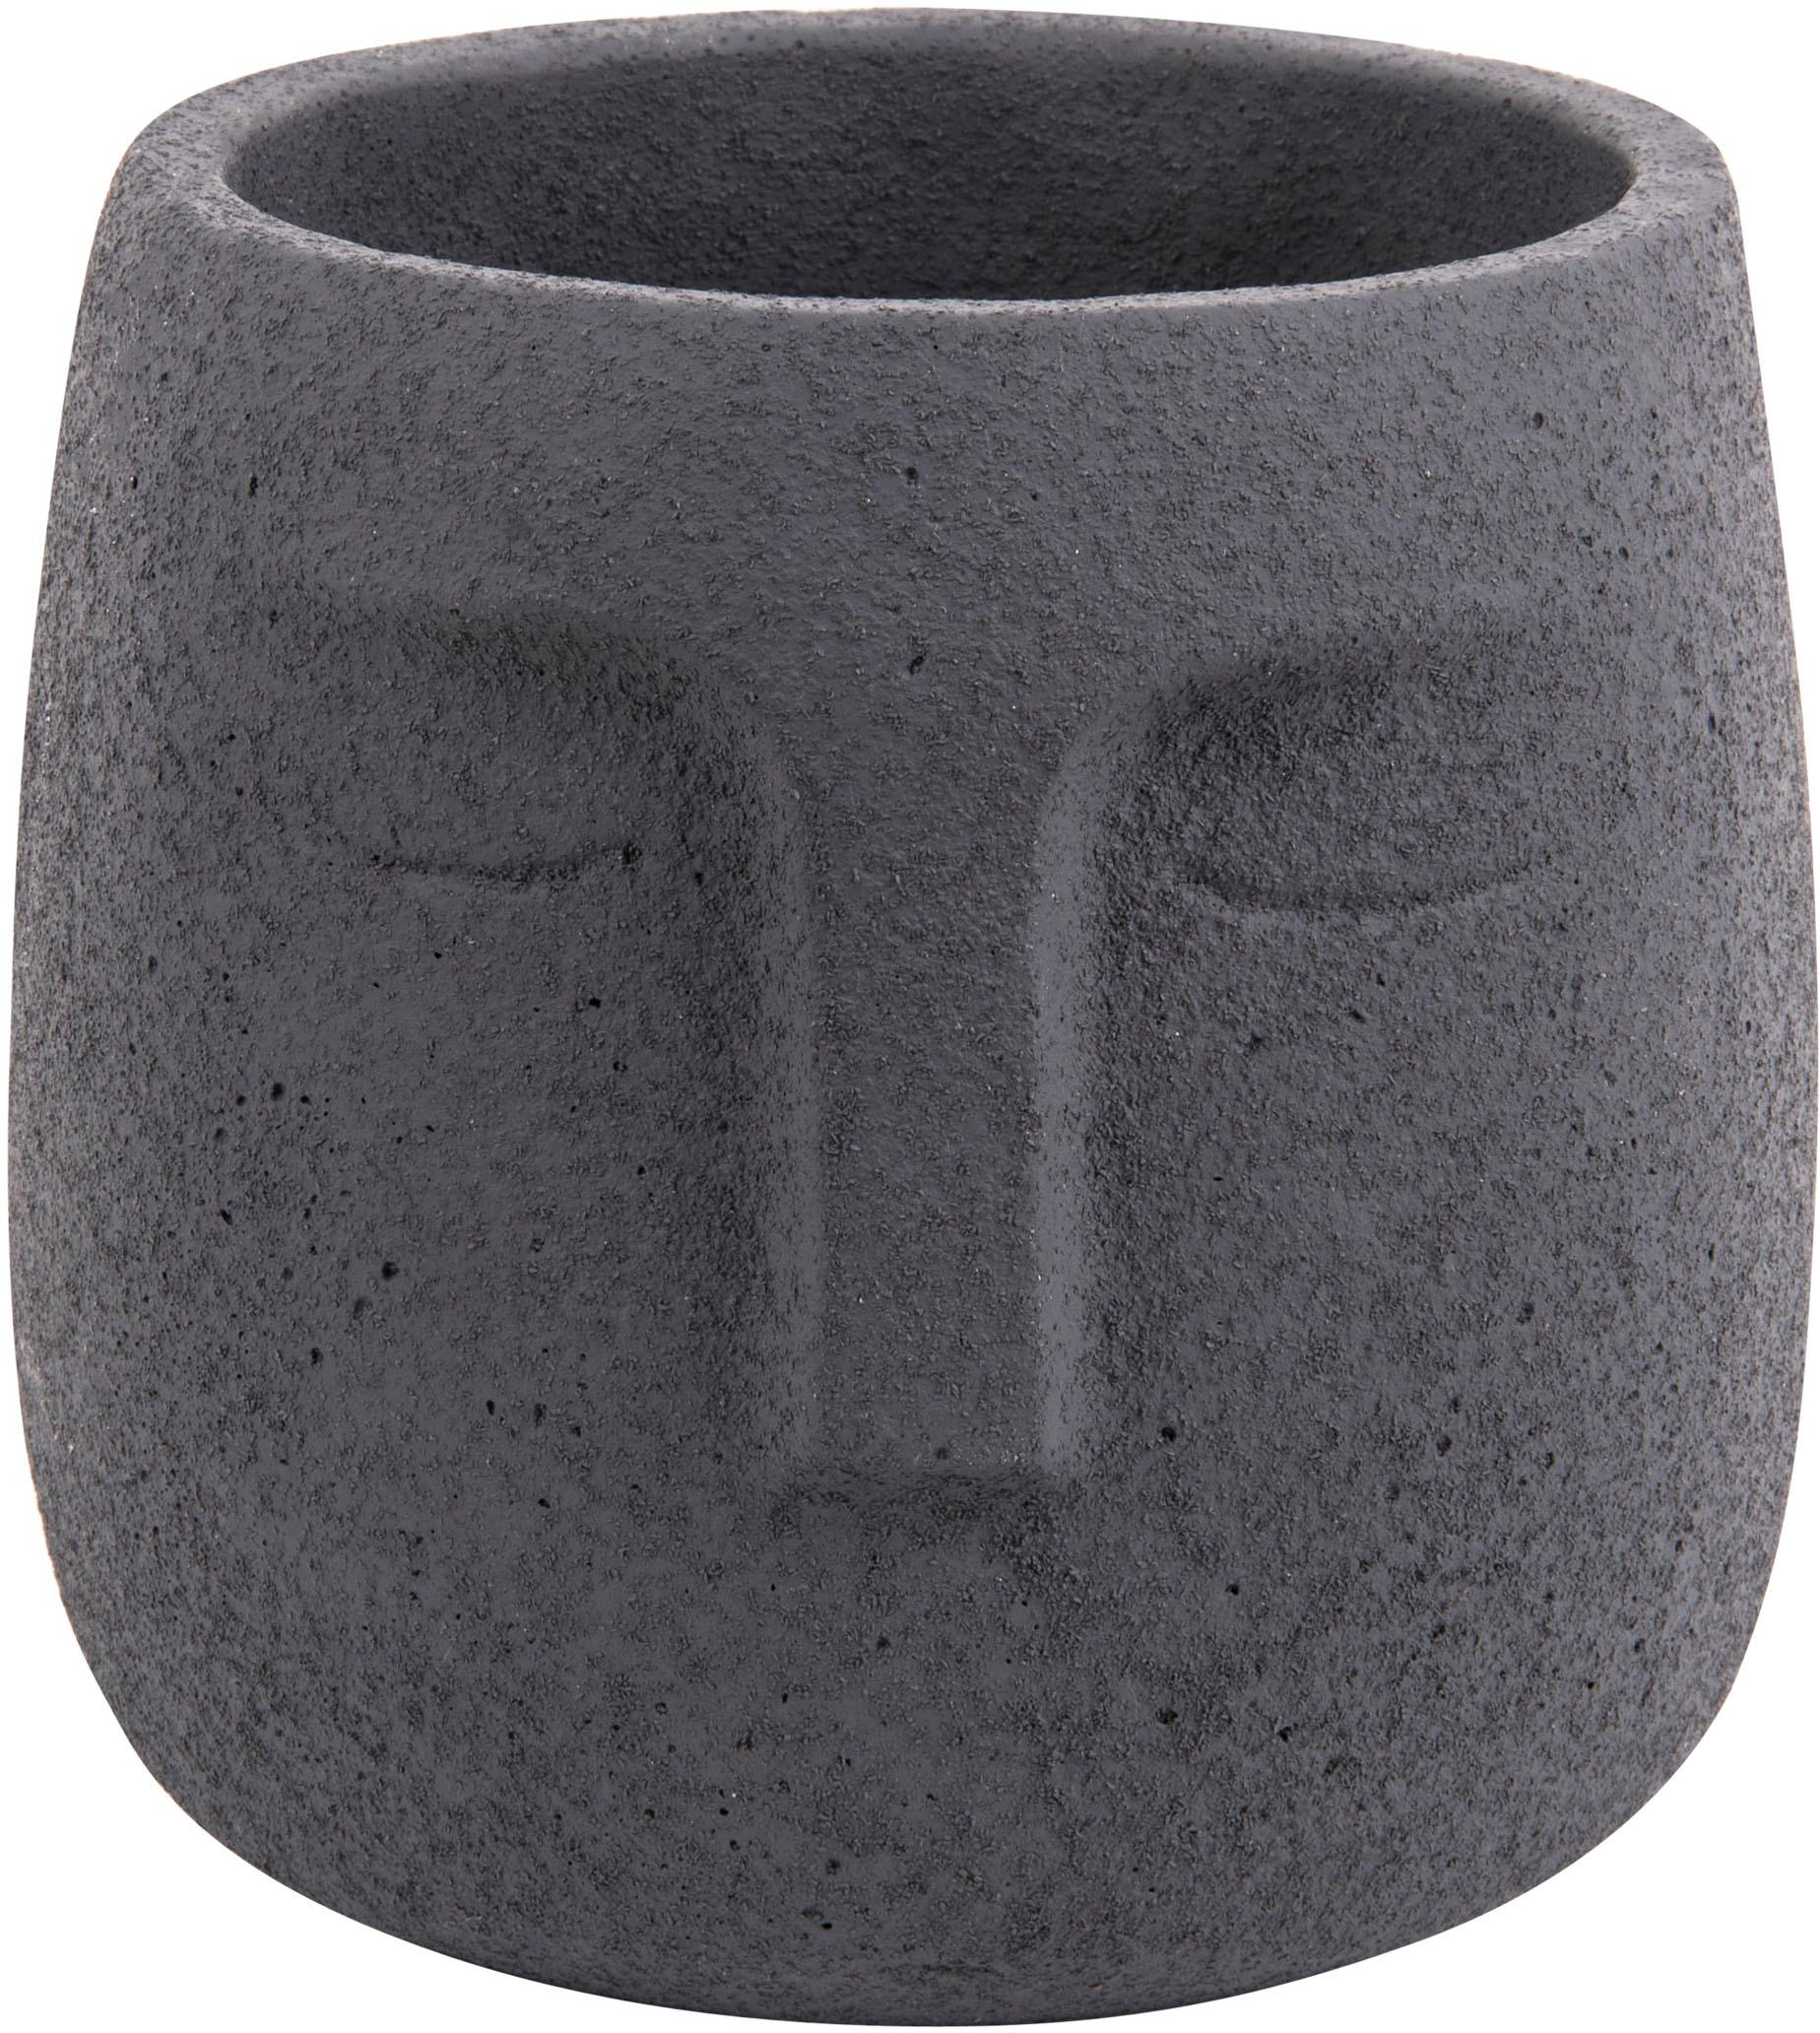 Kleine plantenpot Face van beton, Betonkleurig, Donkerblauw, Ø 13 x H 14 cm